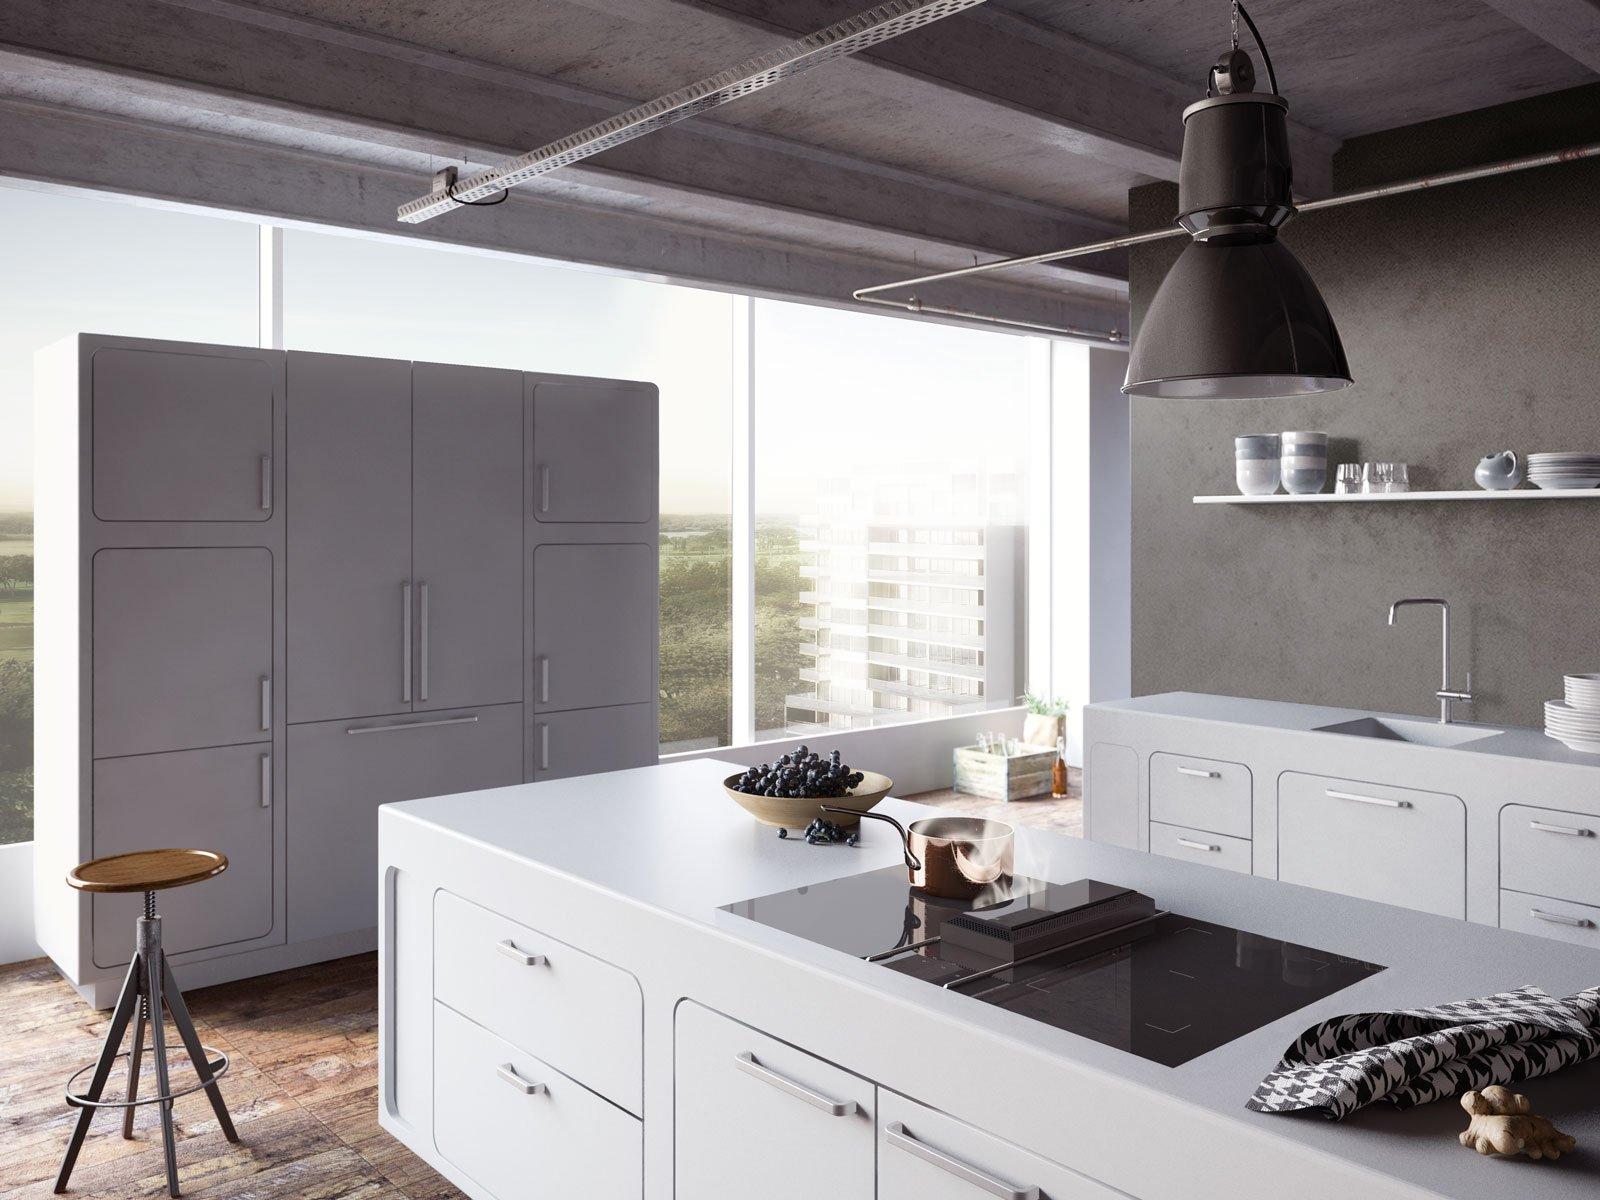 Cappe obbligatorie ma anche indispensabili specie nella cucina a vista cose di casa - Cappe da cucina classiche ...